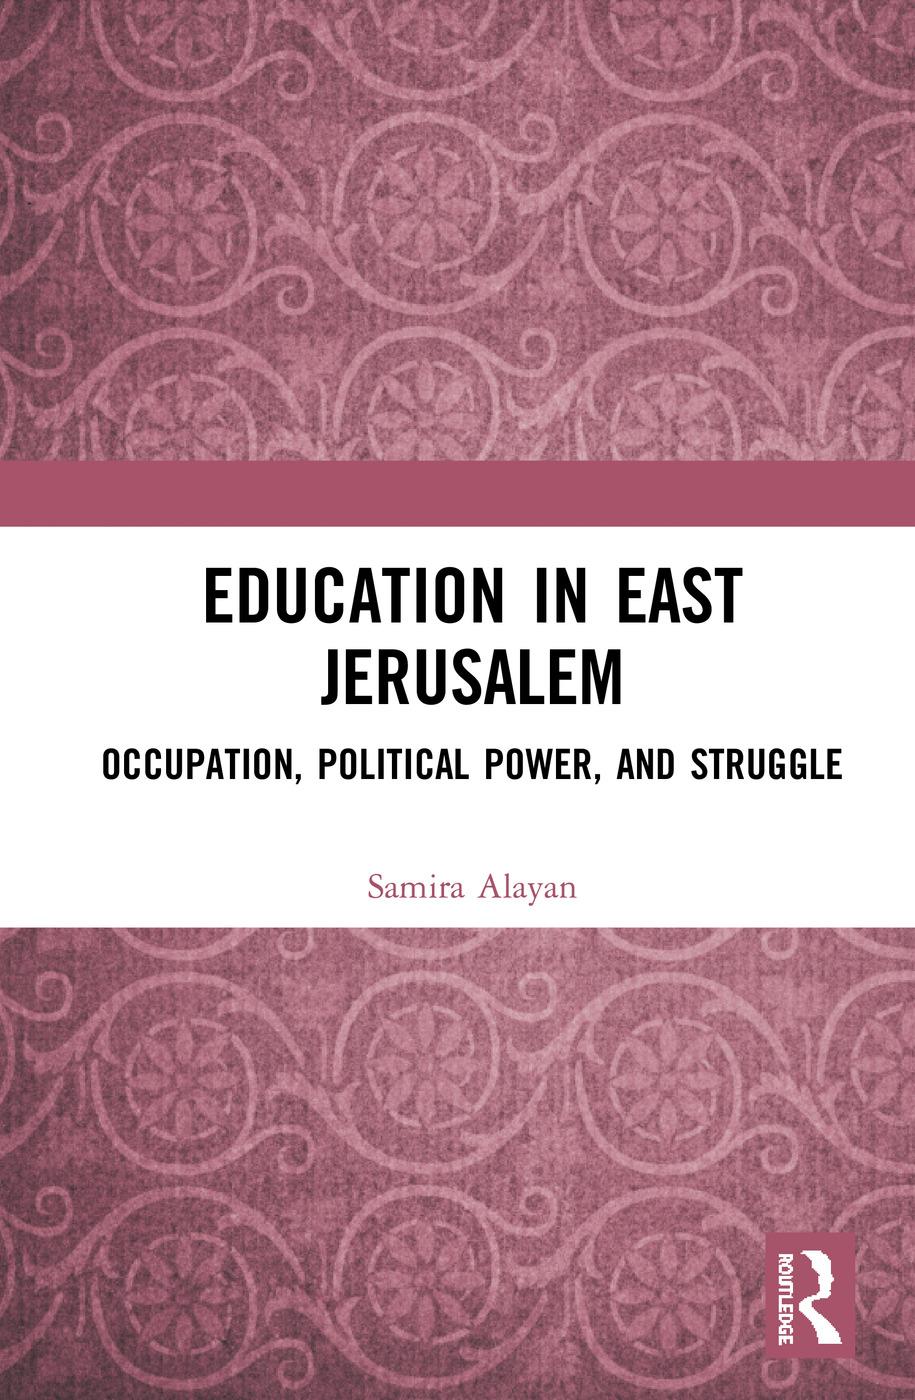 Education in East Jerusalem: Occupation, Political Power, and Struggle, 1st Edition (Hardback) book cover